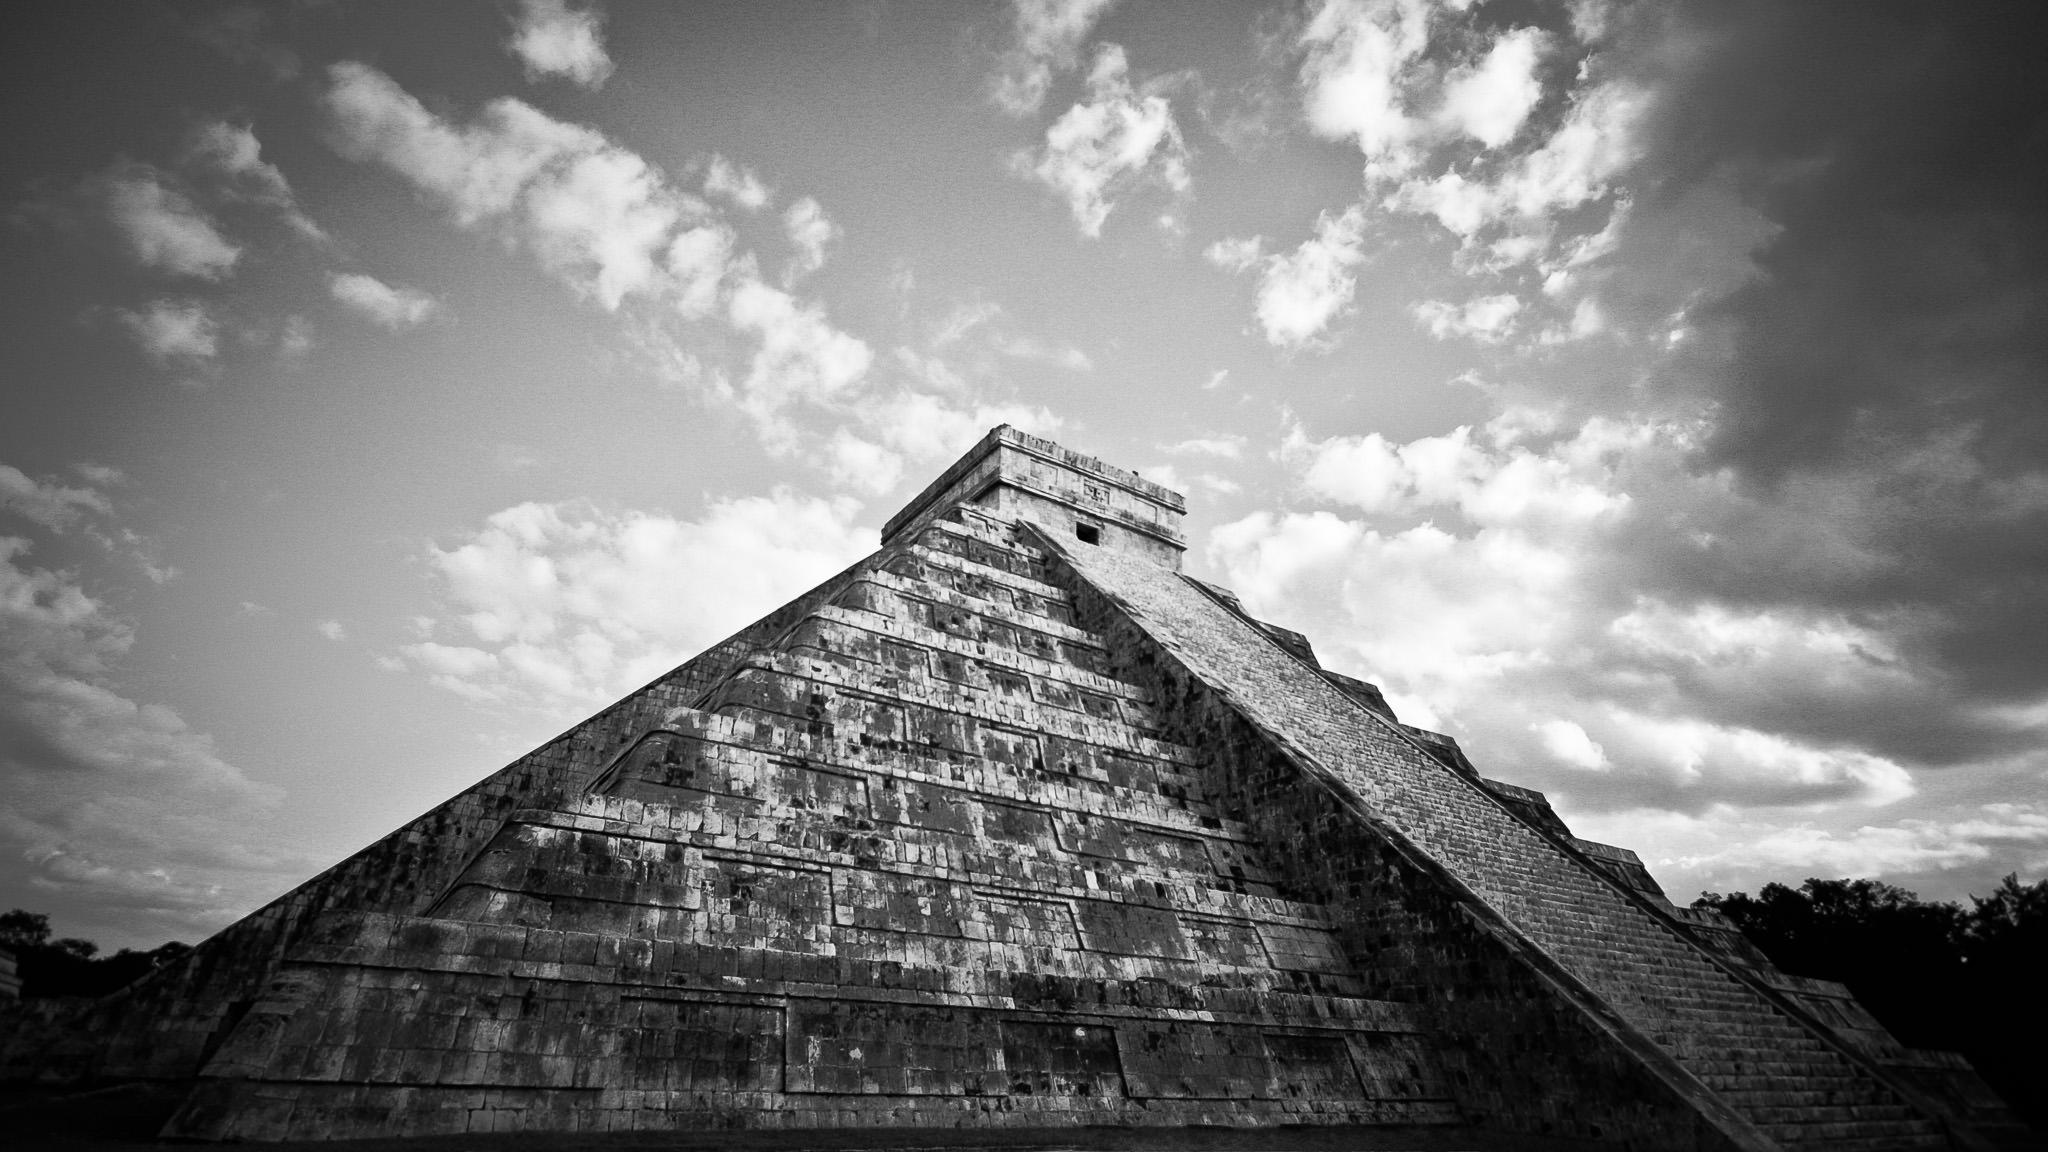 Pyramid of Kukulkan